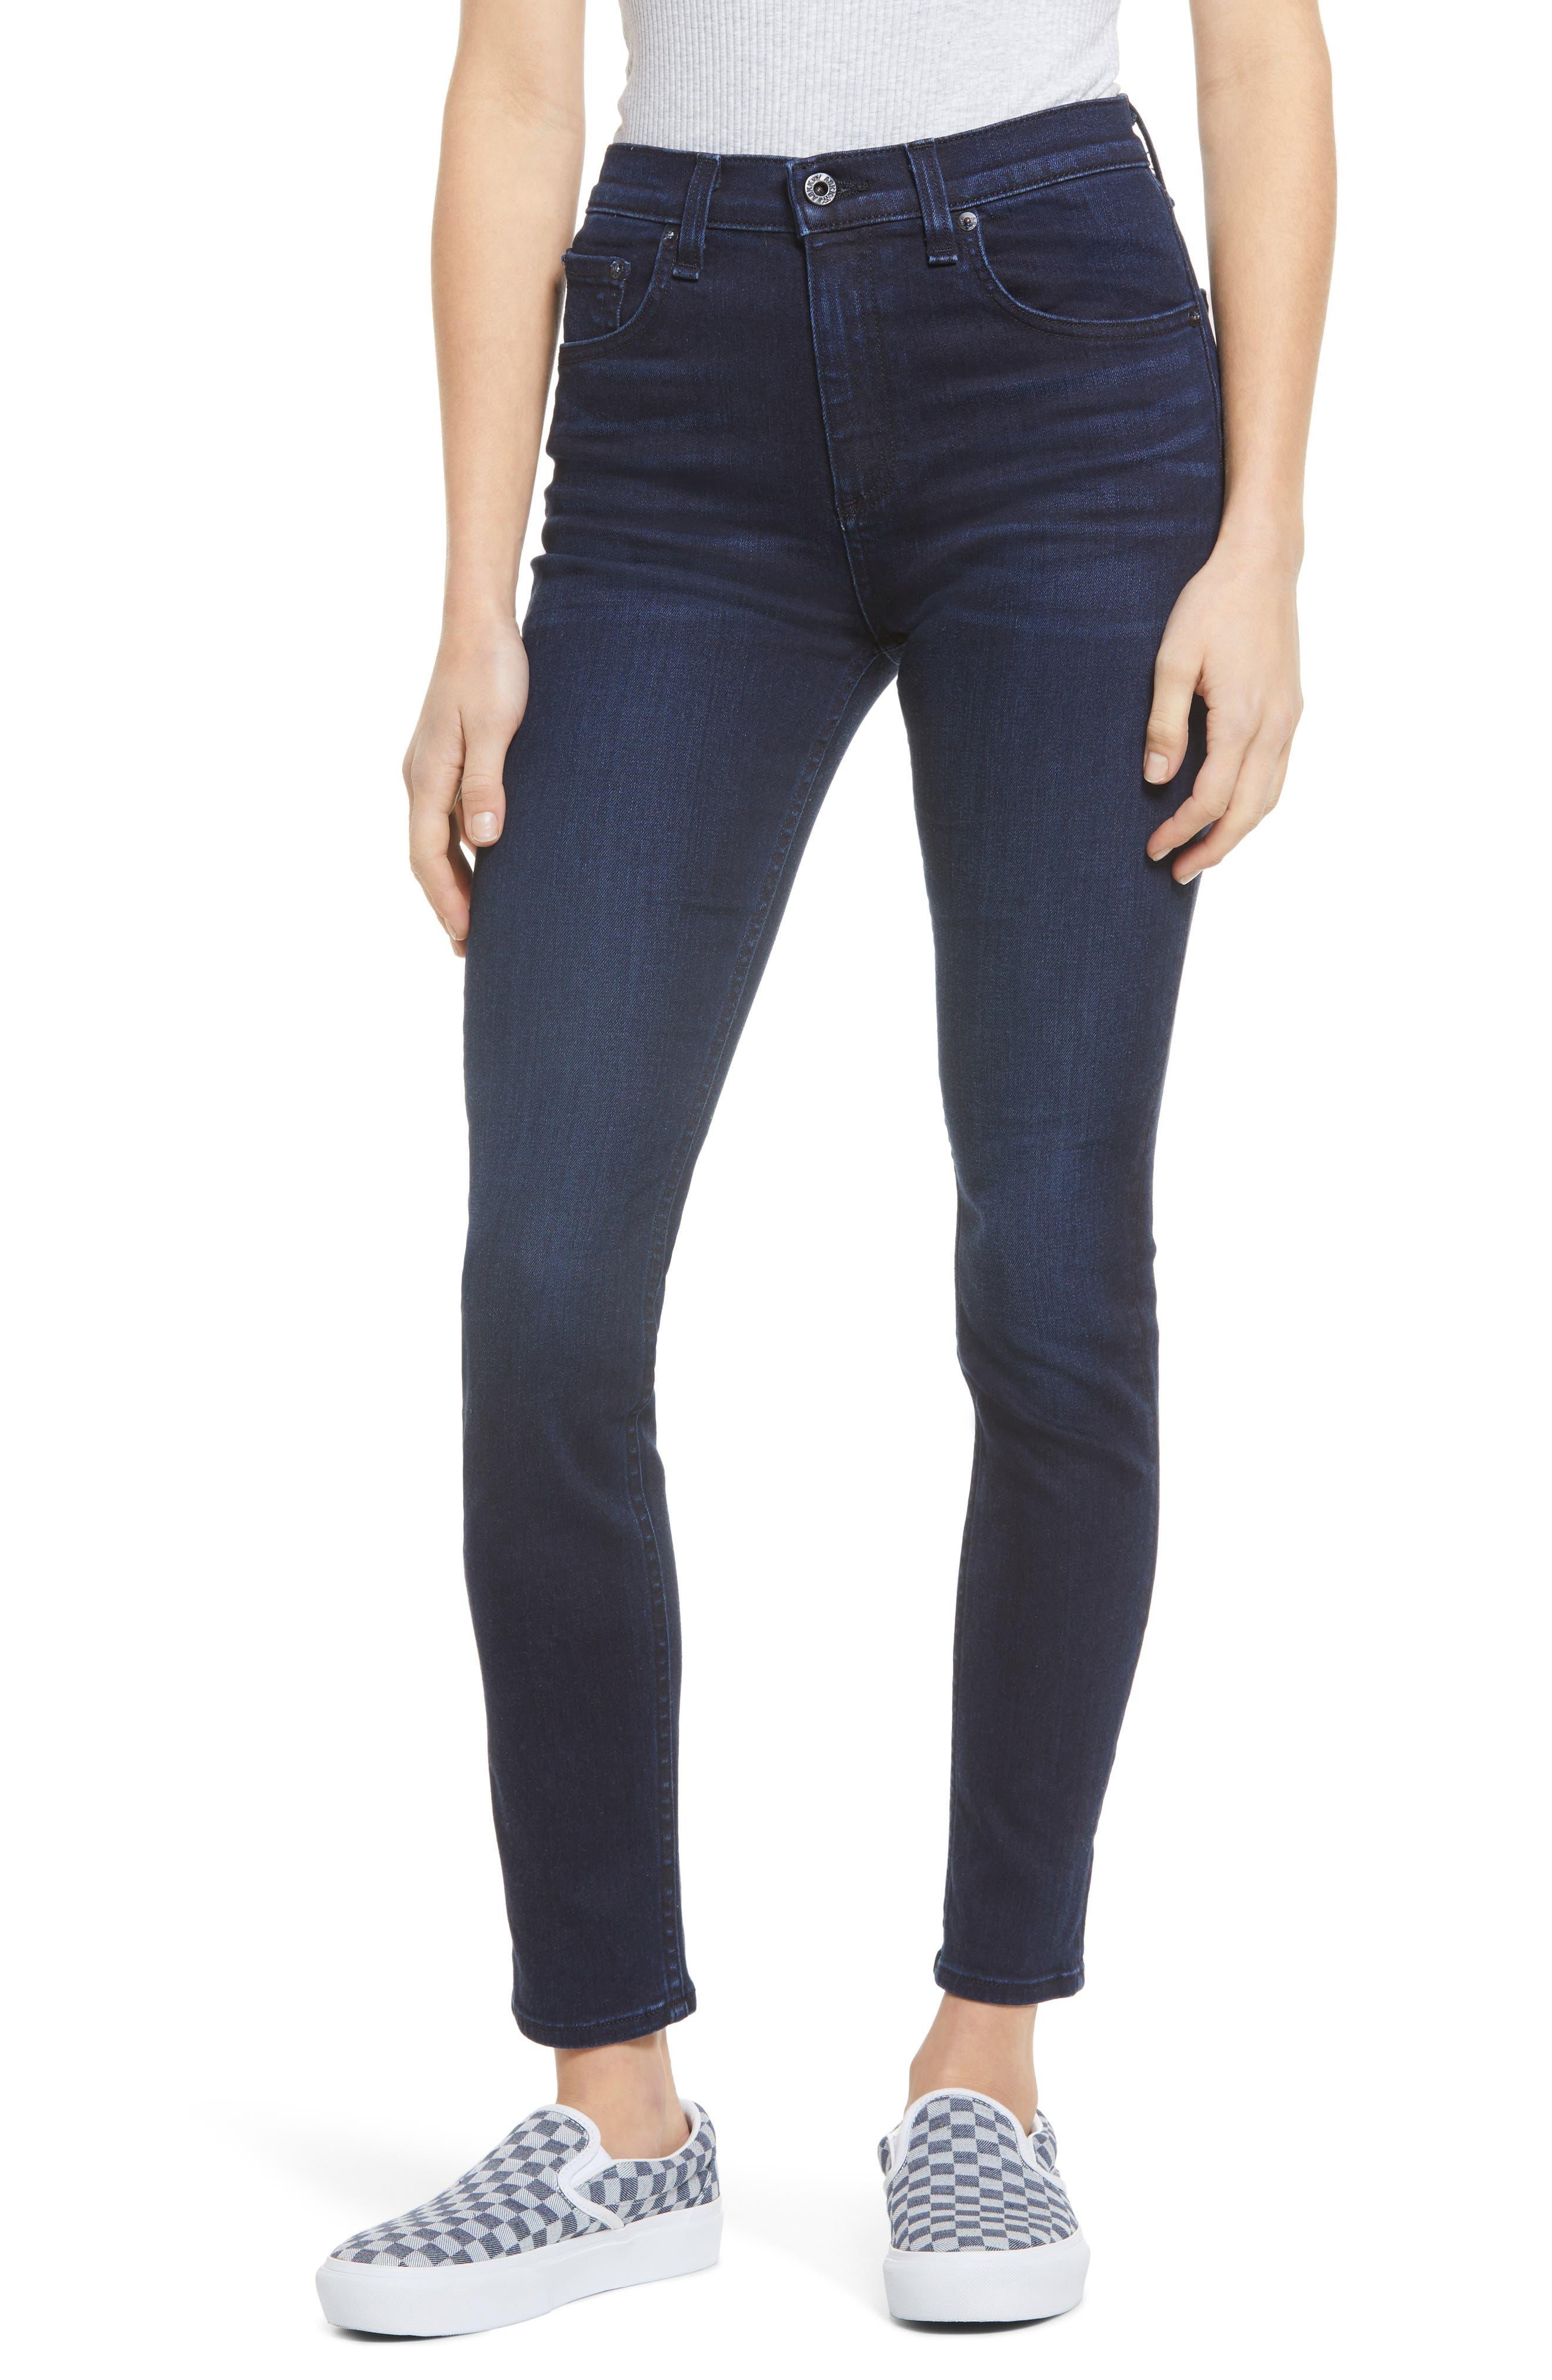 High Waist Ankle Skinny Jeans